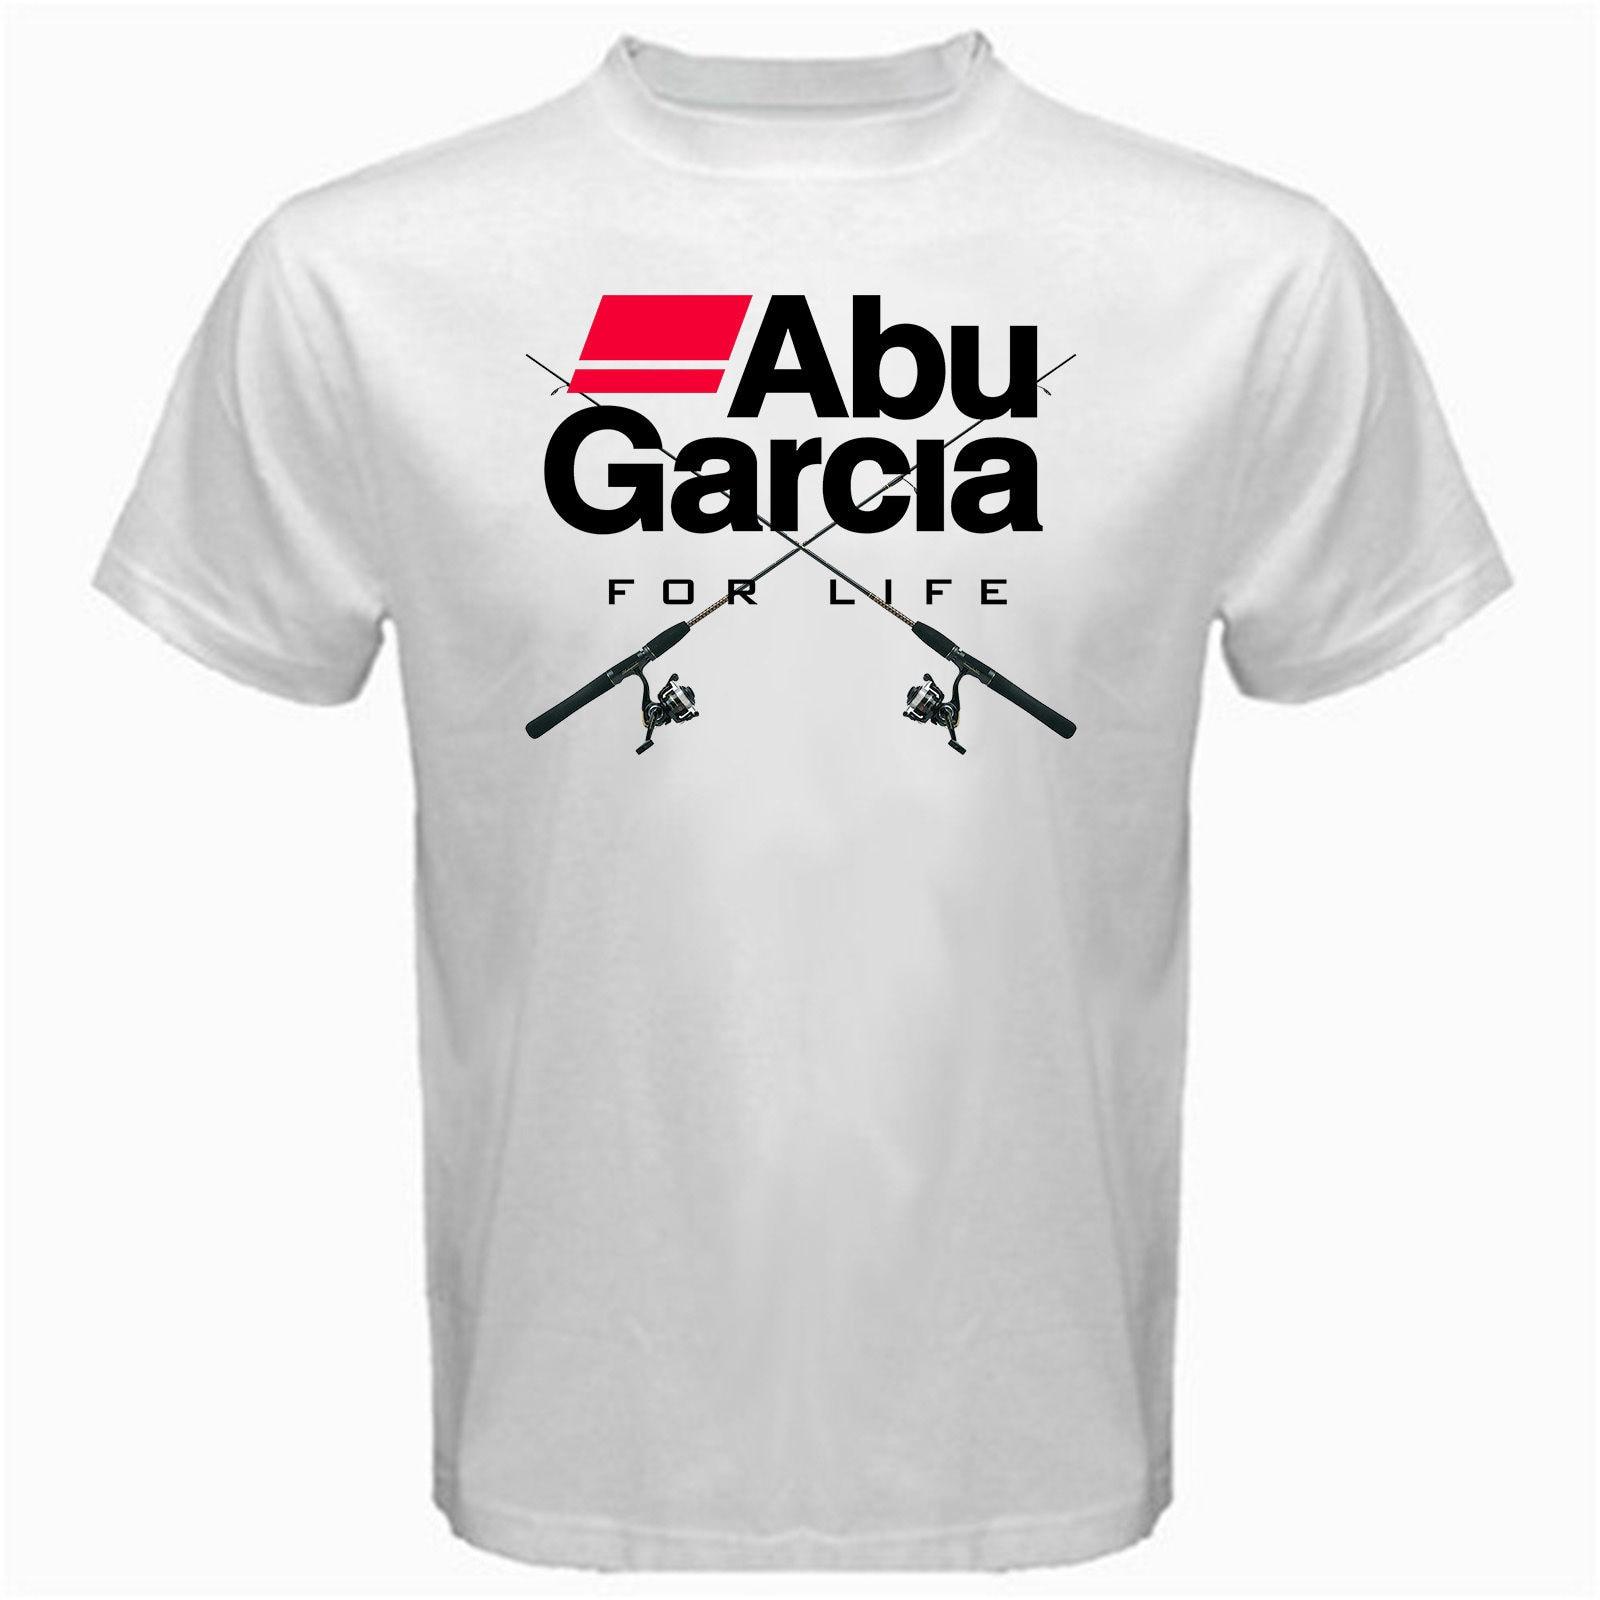 Abu garcia dufresne and redding fishinger galveston panama t shirt 2017 fashion short sleeve black adult t-shirt s-2xl-1